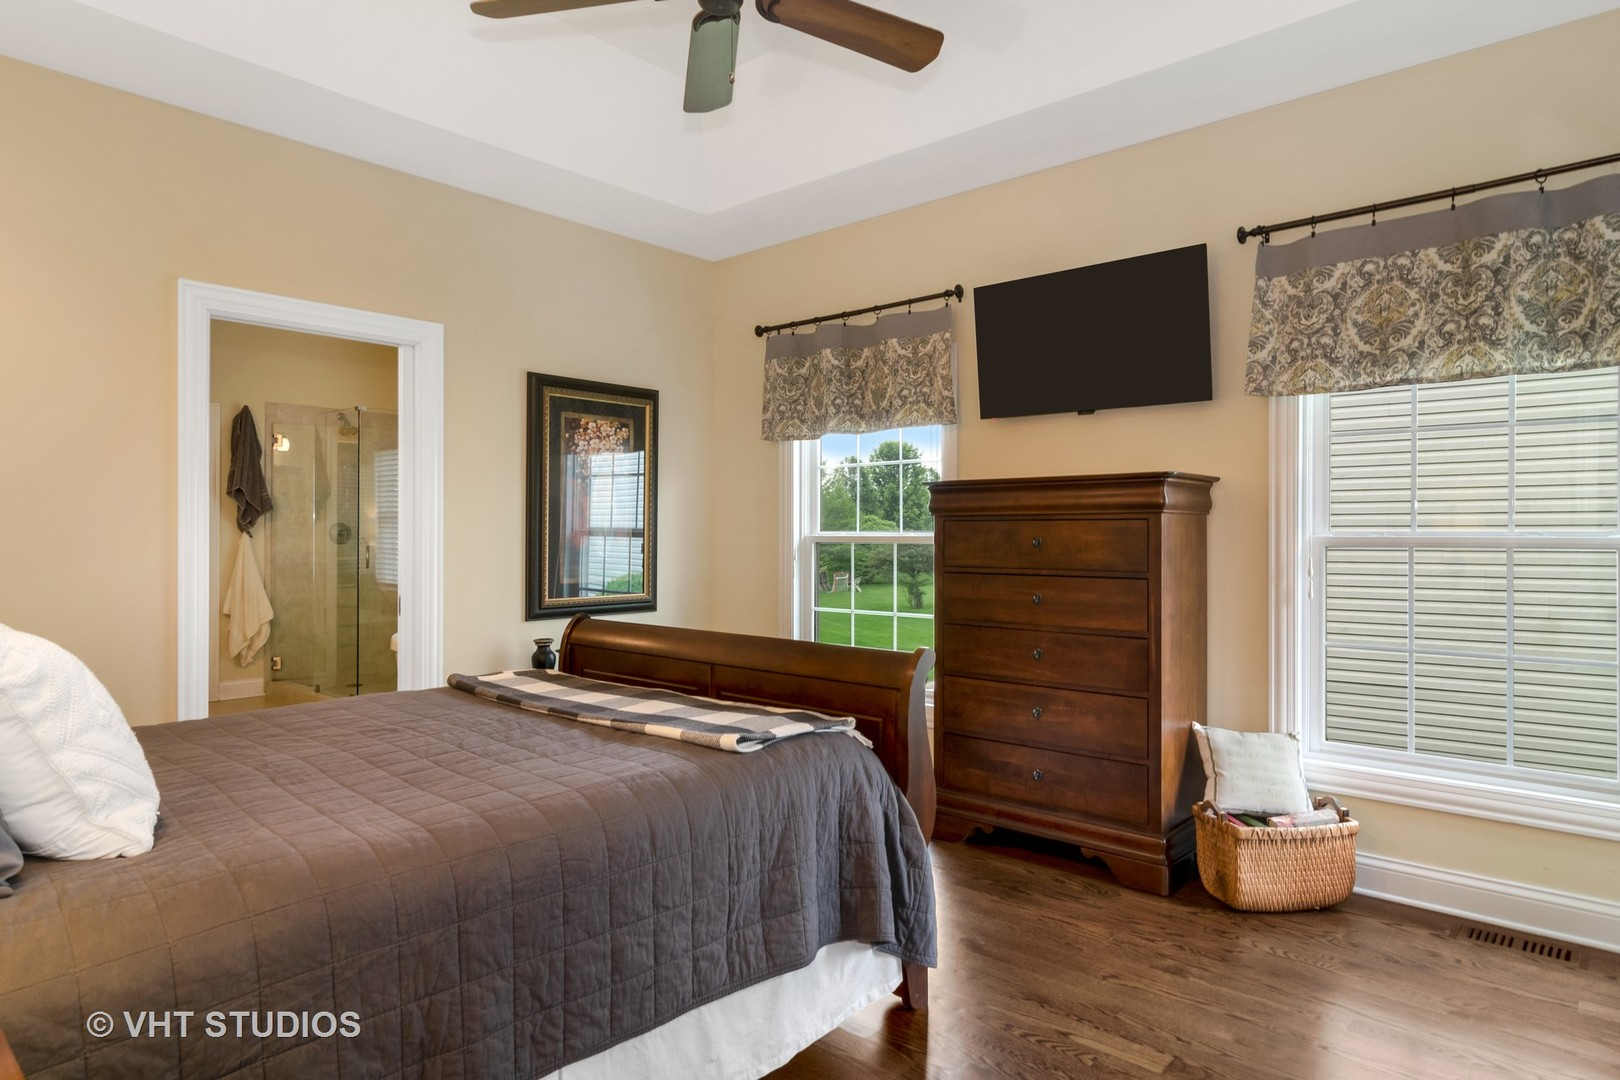 1001 Kingsmill, ALGONQUIN, Illinois, 60102